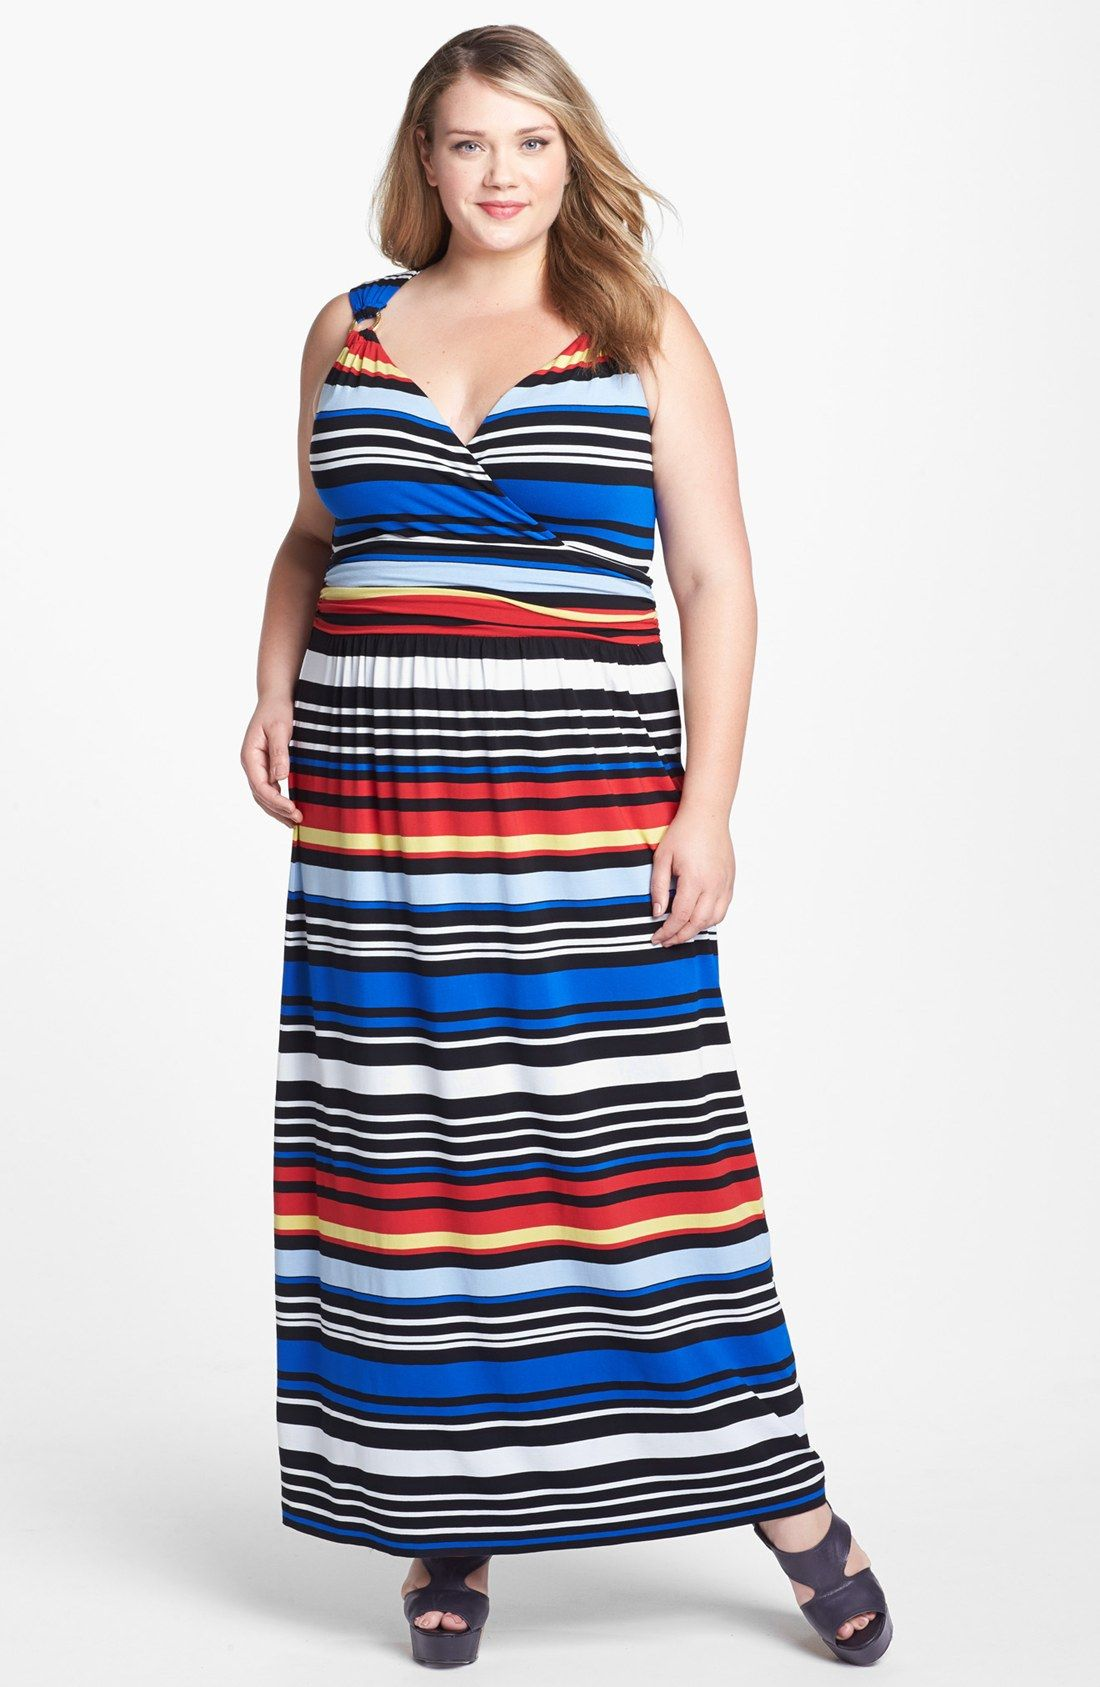 Vince Camuto Bright Stripe Maxi Dress Plus Size Online Only Nordstrom Maxi Dress Plus Size Dresses Dresses [ 1687 x 1100 Pixel ]